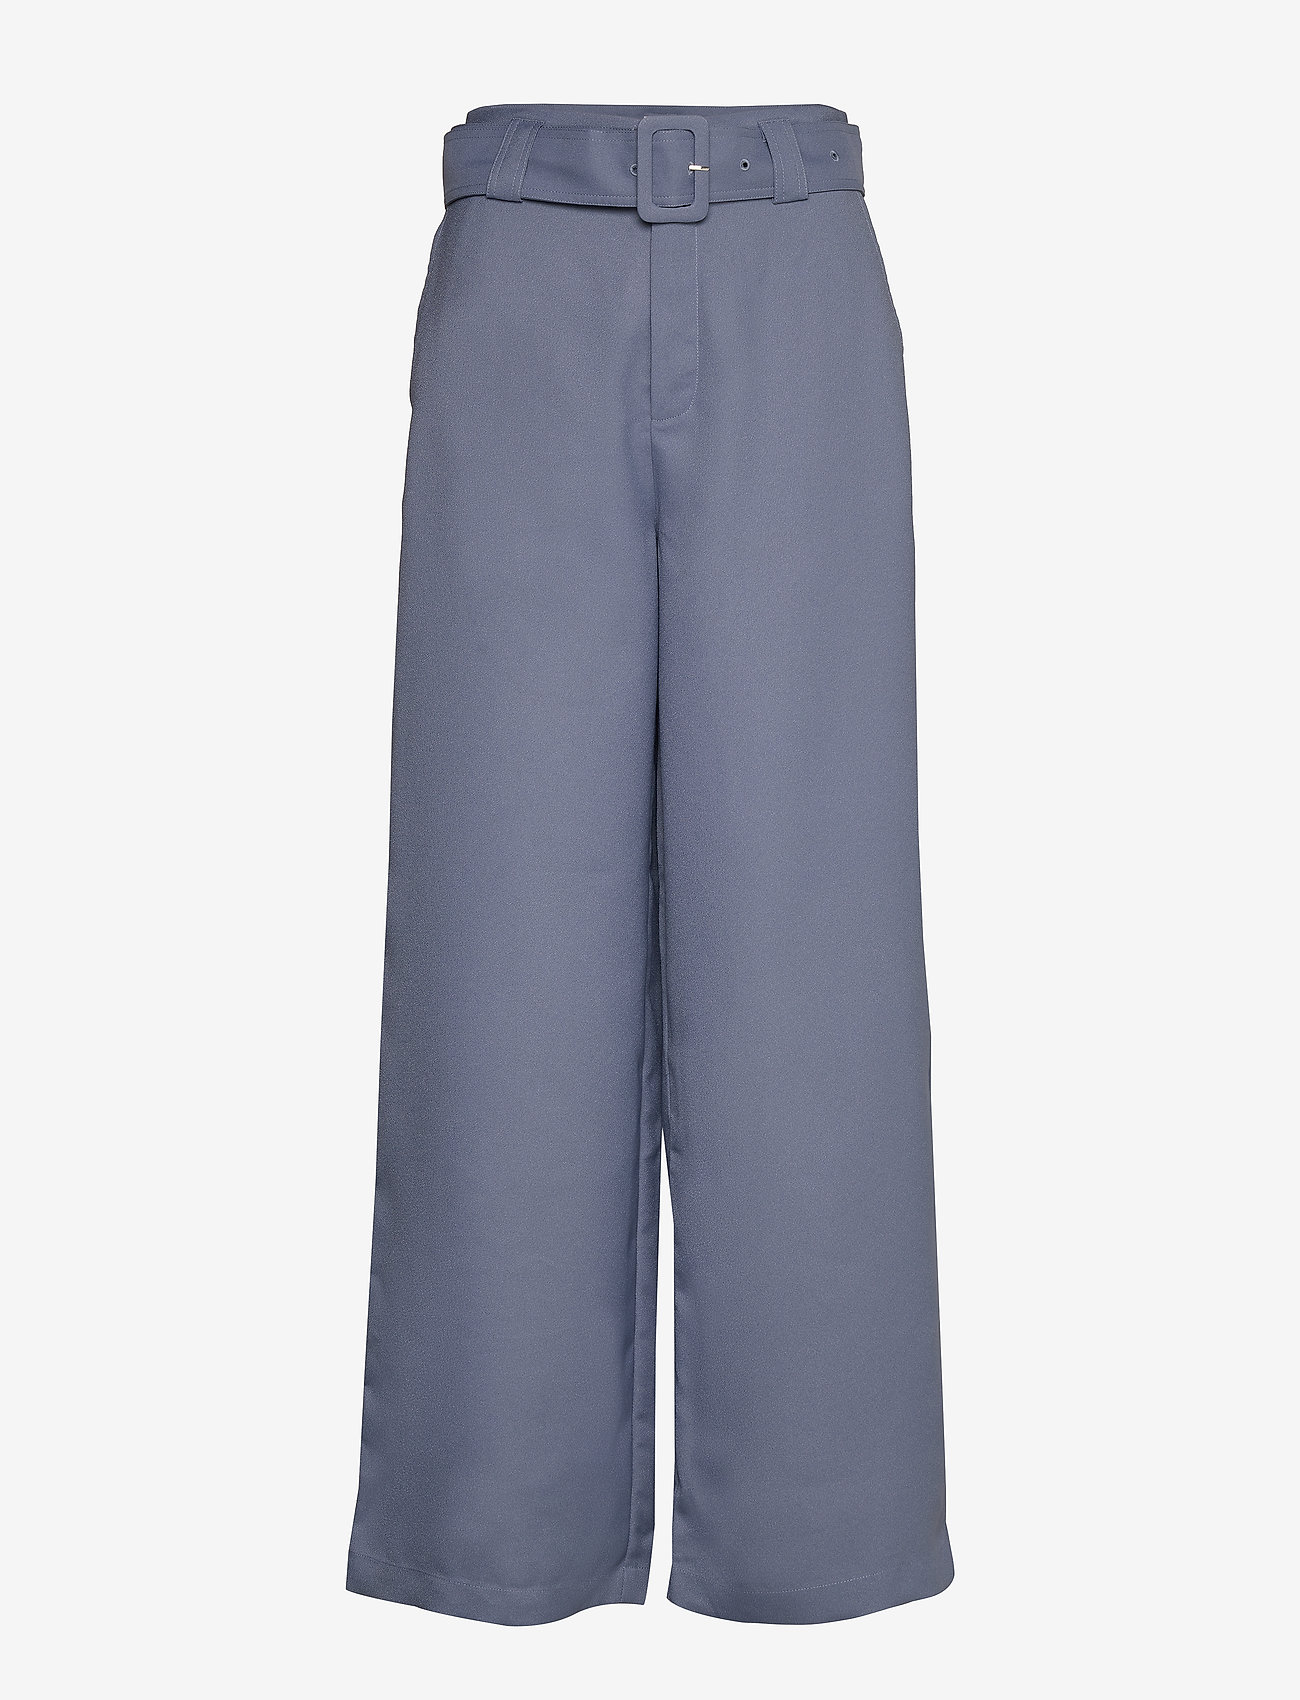 Twist & Tango - Freja Trousers - casual trousers - greyish blue - 0